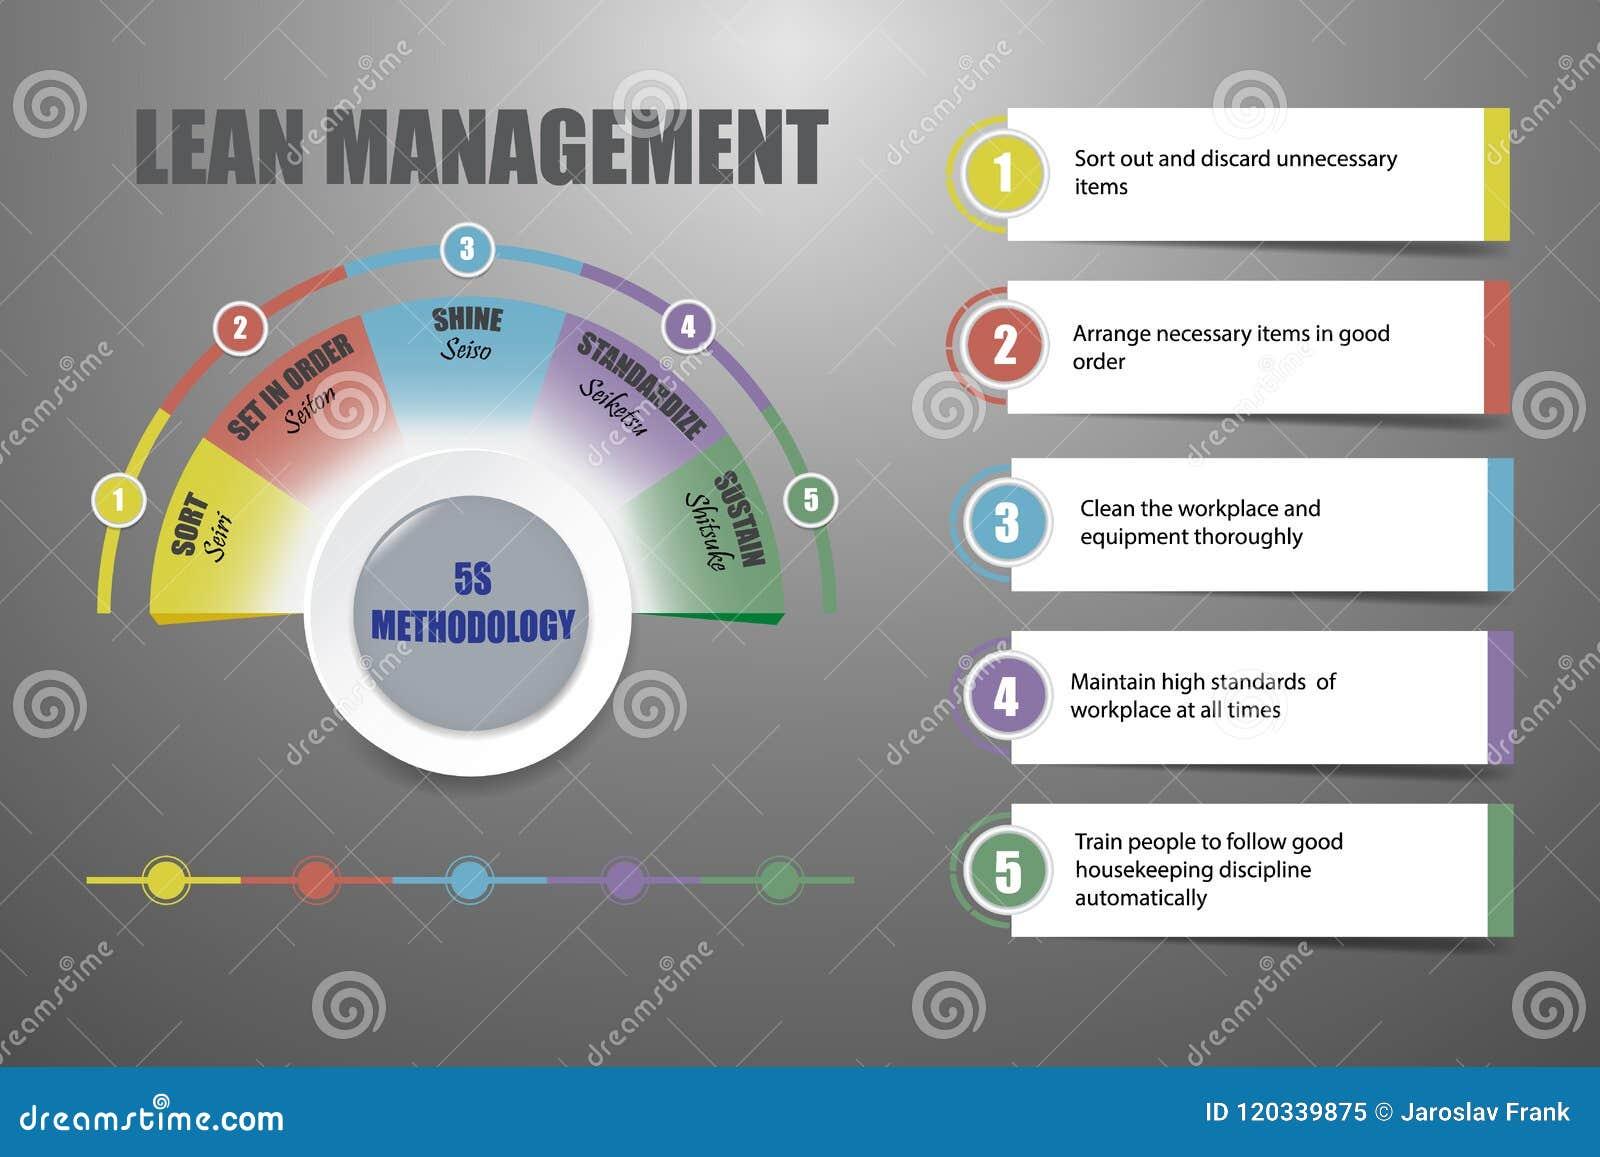 Schlankes Management - Konzeptvektor der Methodologie 5S